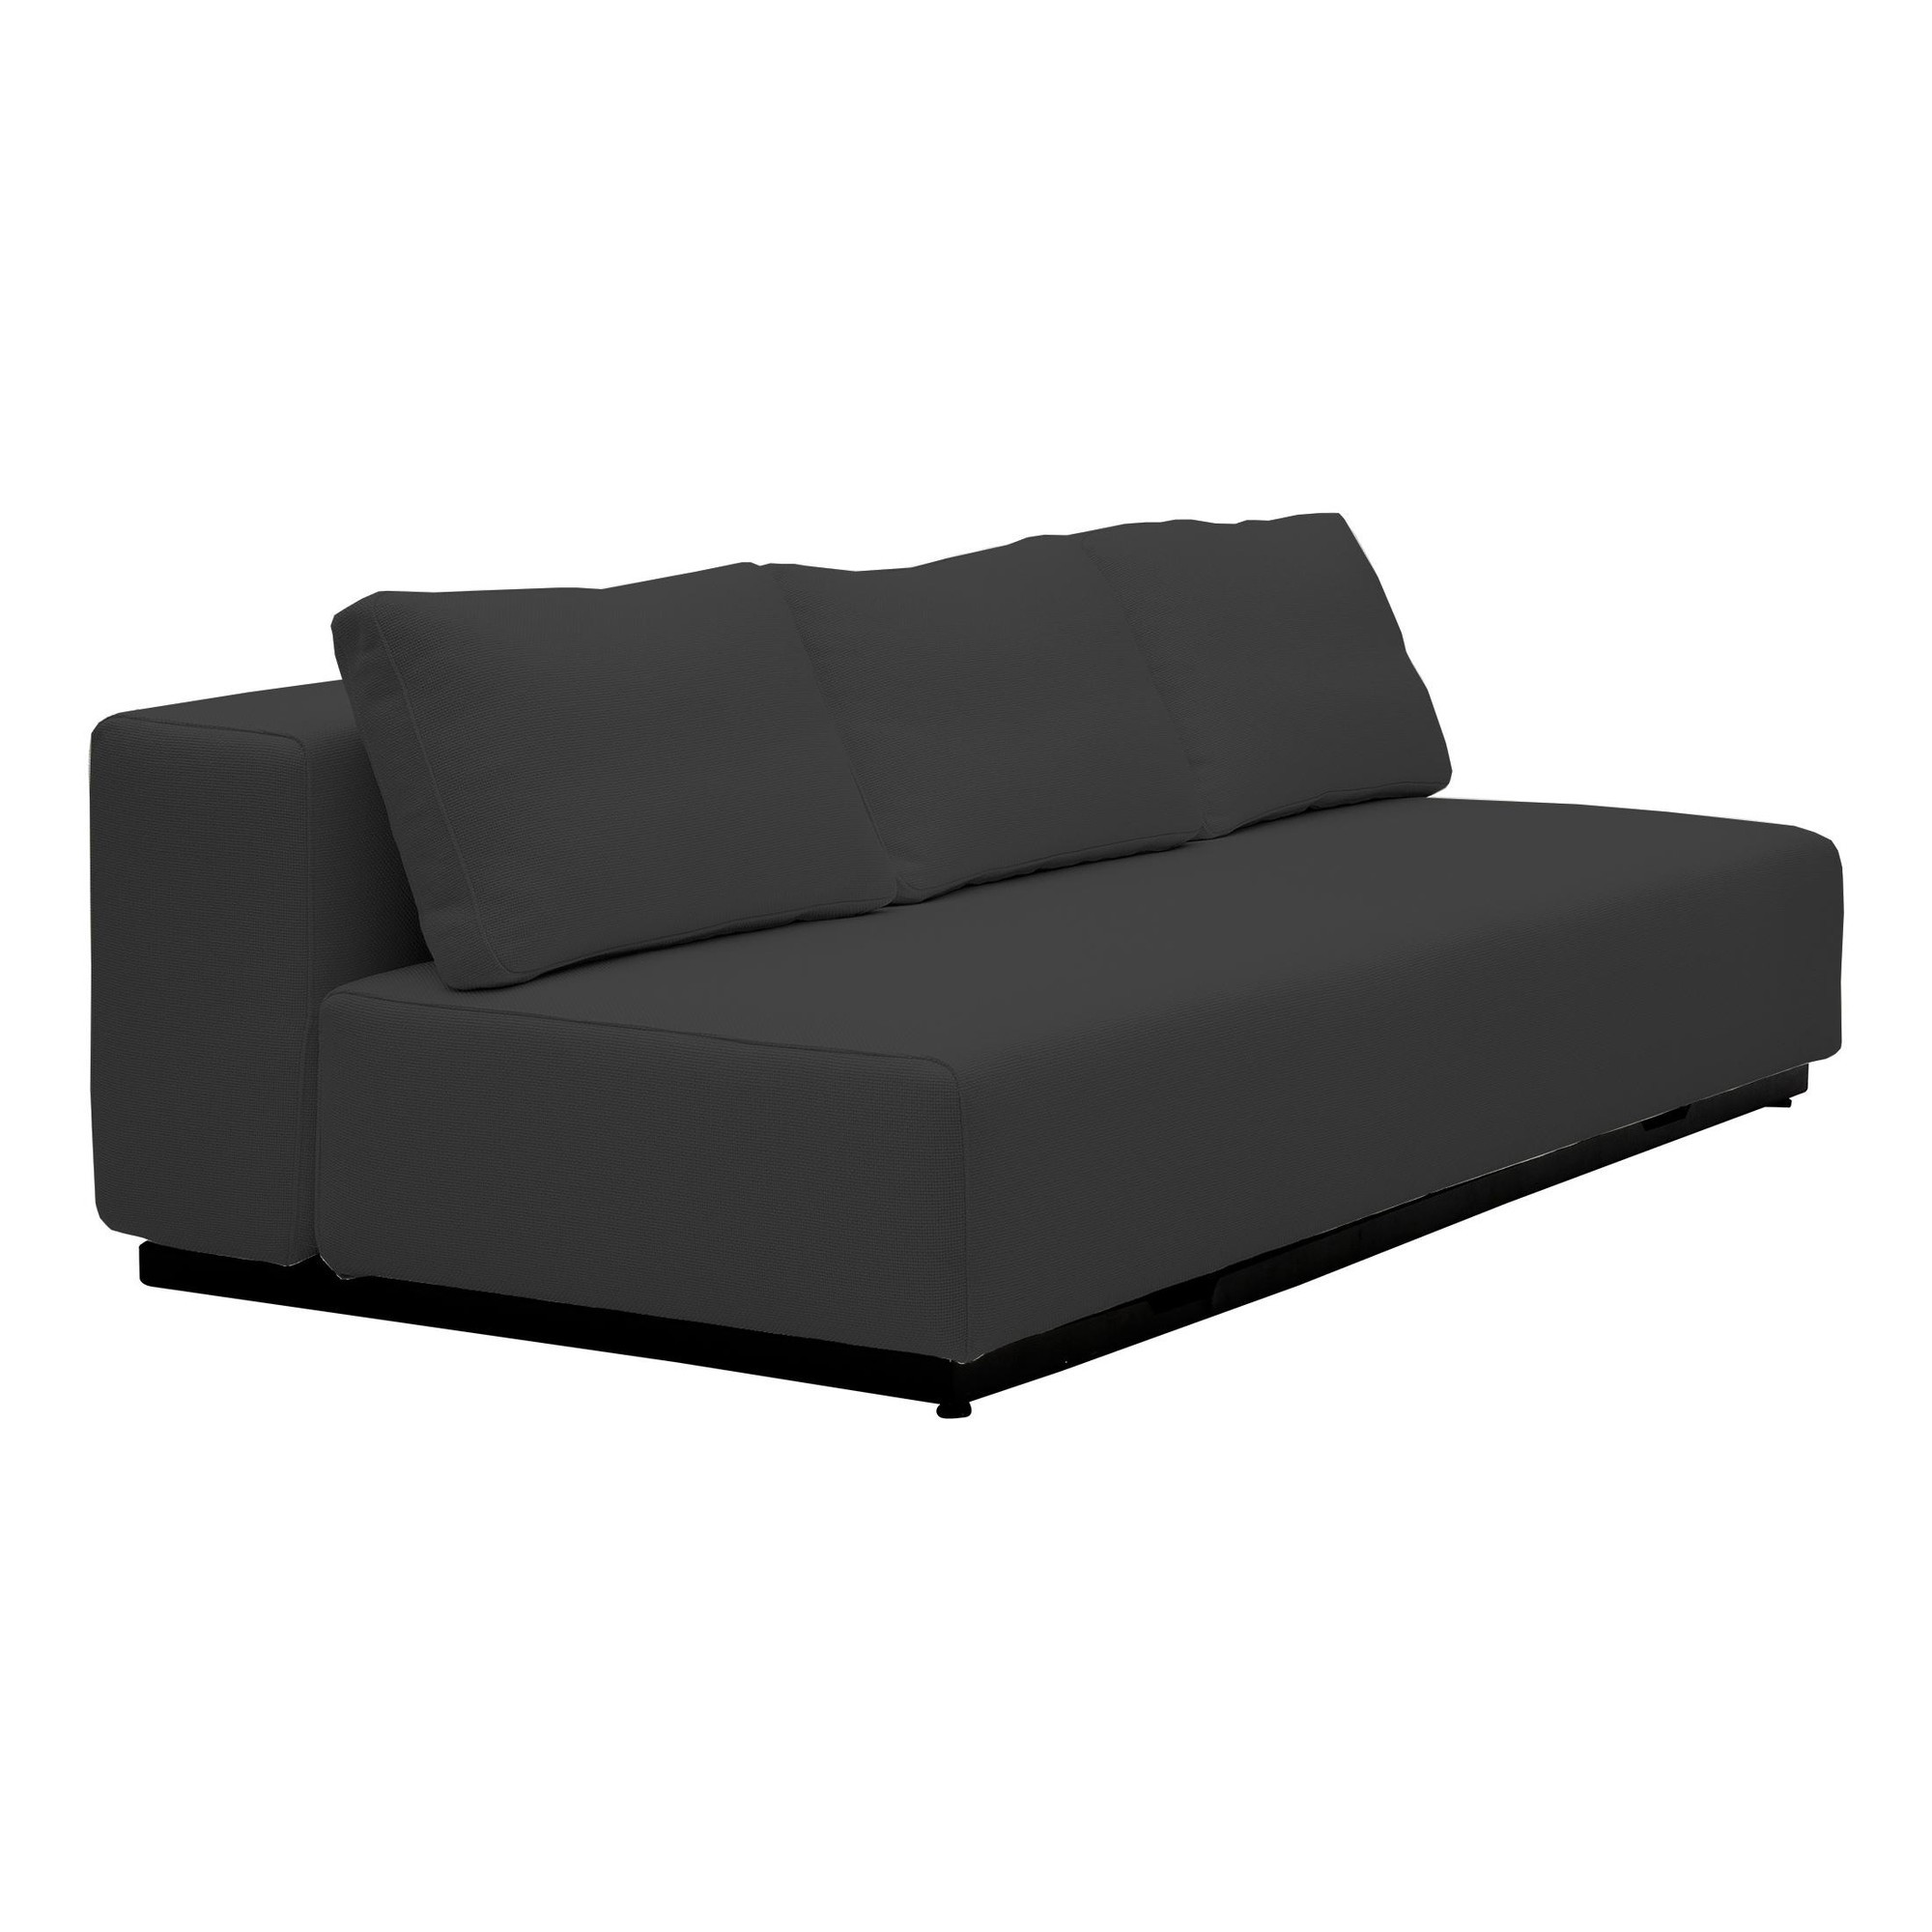 Softline Nevada 3 P Sofa Bed Anthracite Fabric